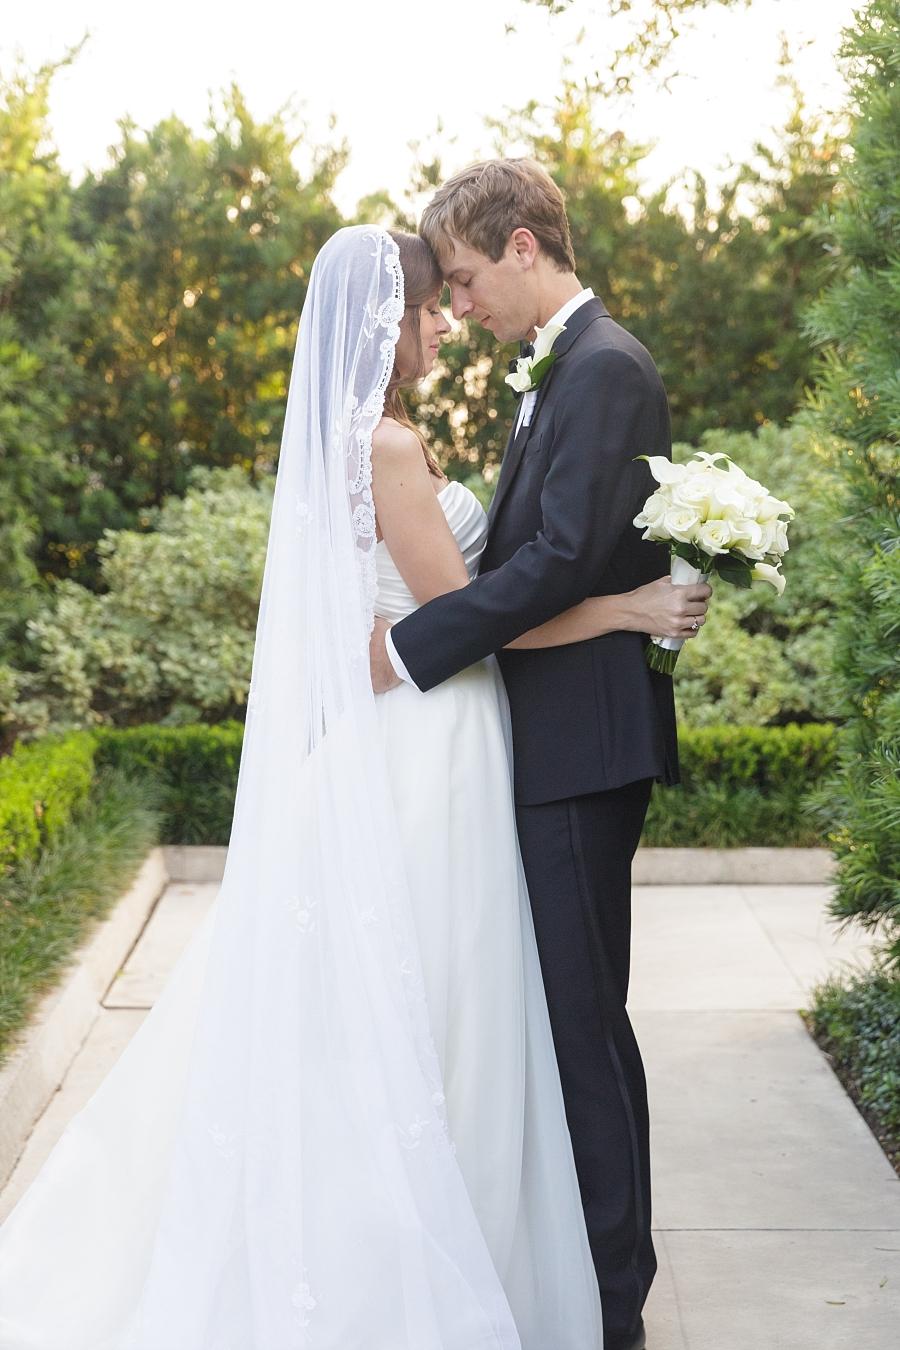 Stacy-Anderson-Photography-McGovern-Centennial-Gardens-Houston-Wedding-Photographer_0055.jpg